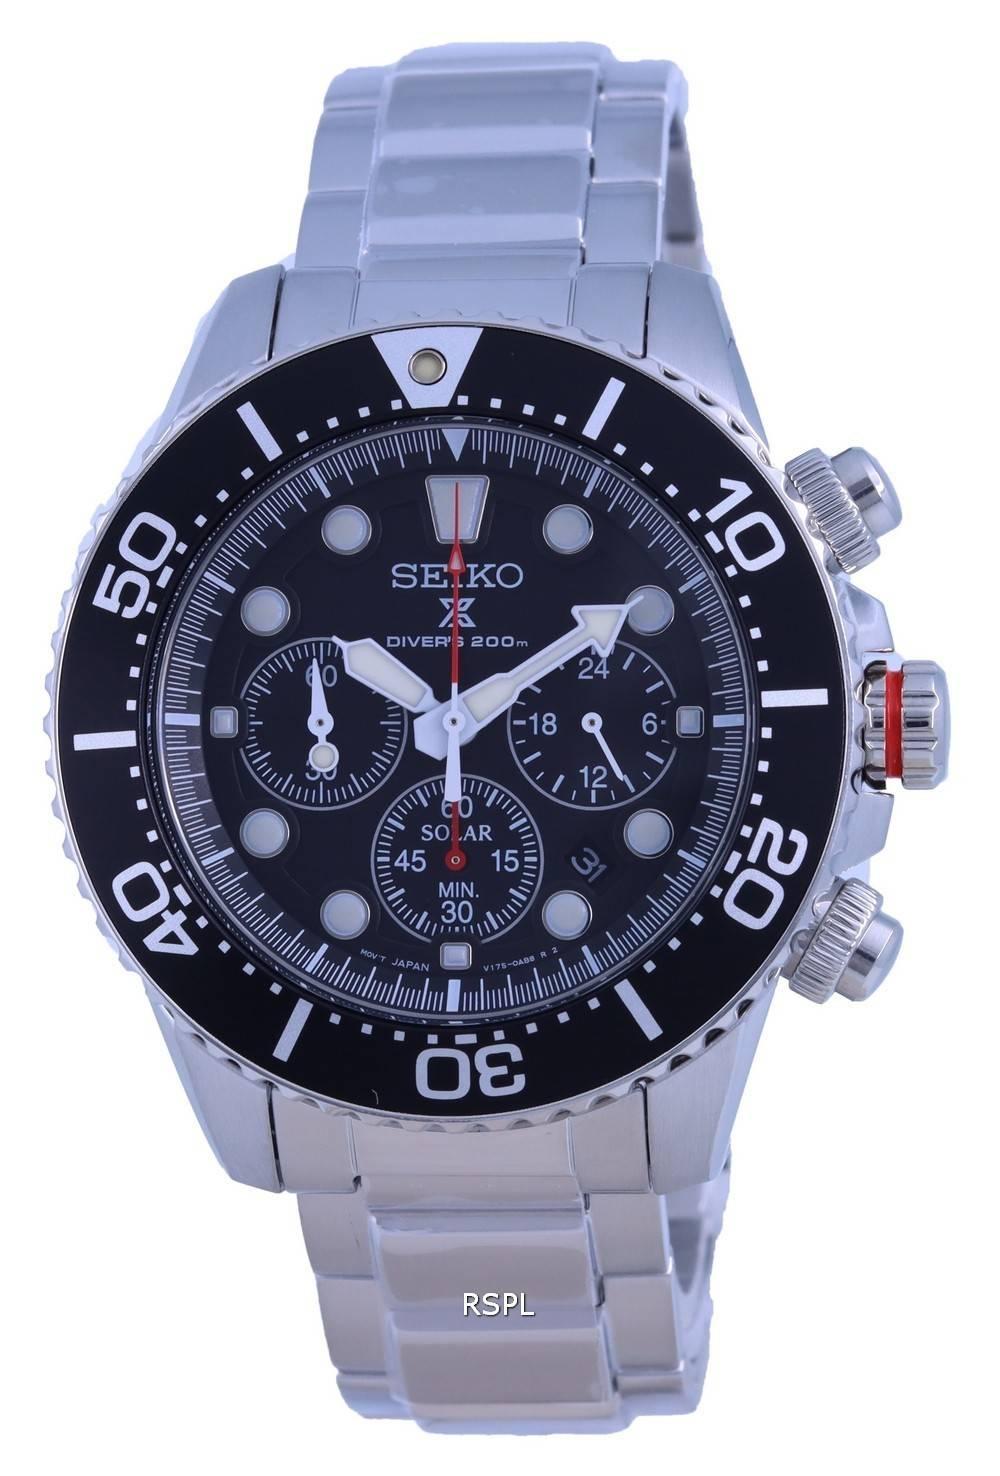 Seiko Prospex Chronograph Solar Divers SSC779 SSC779P1 SSC779P 200M Mens Watch